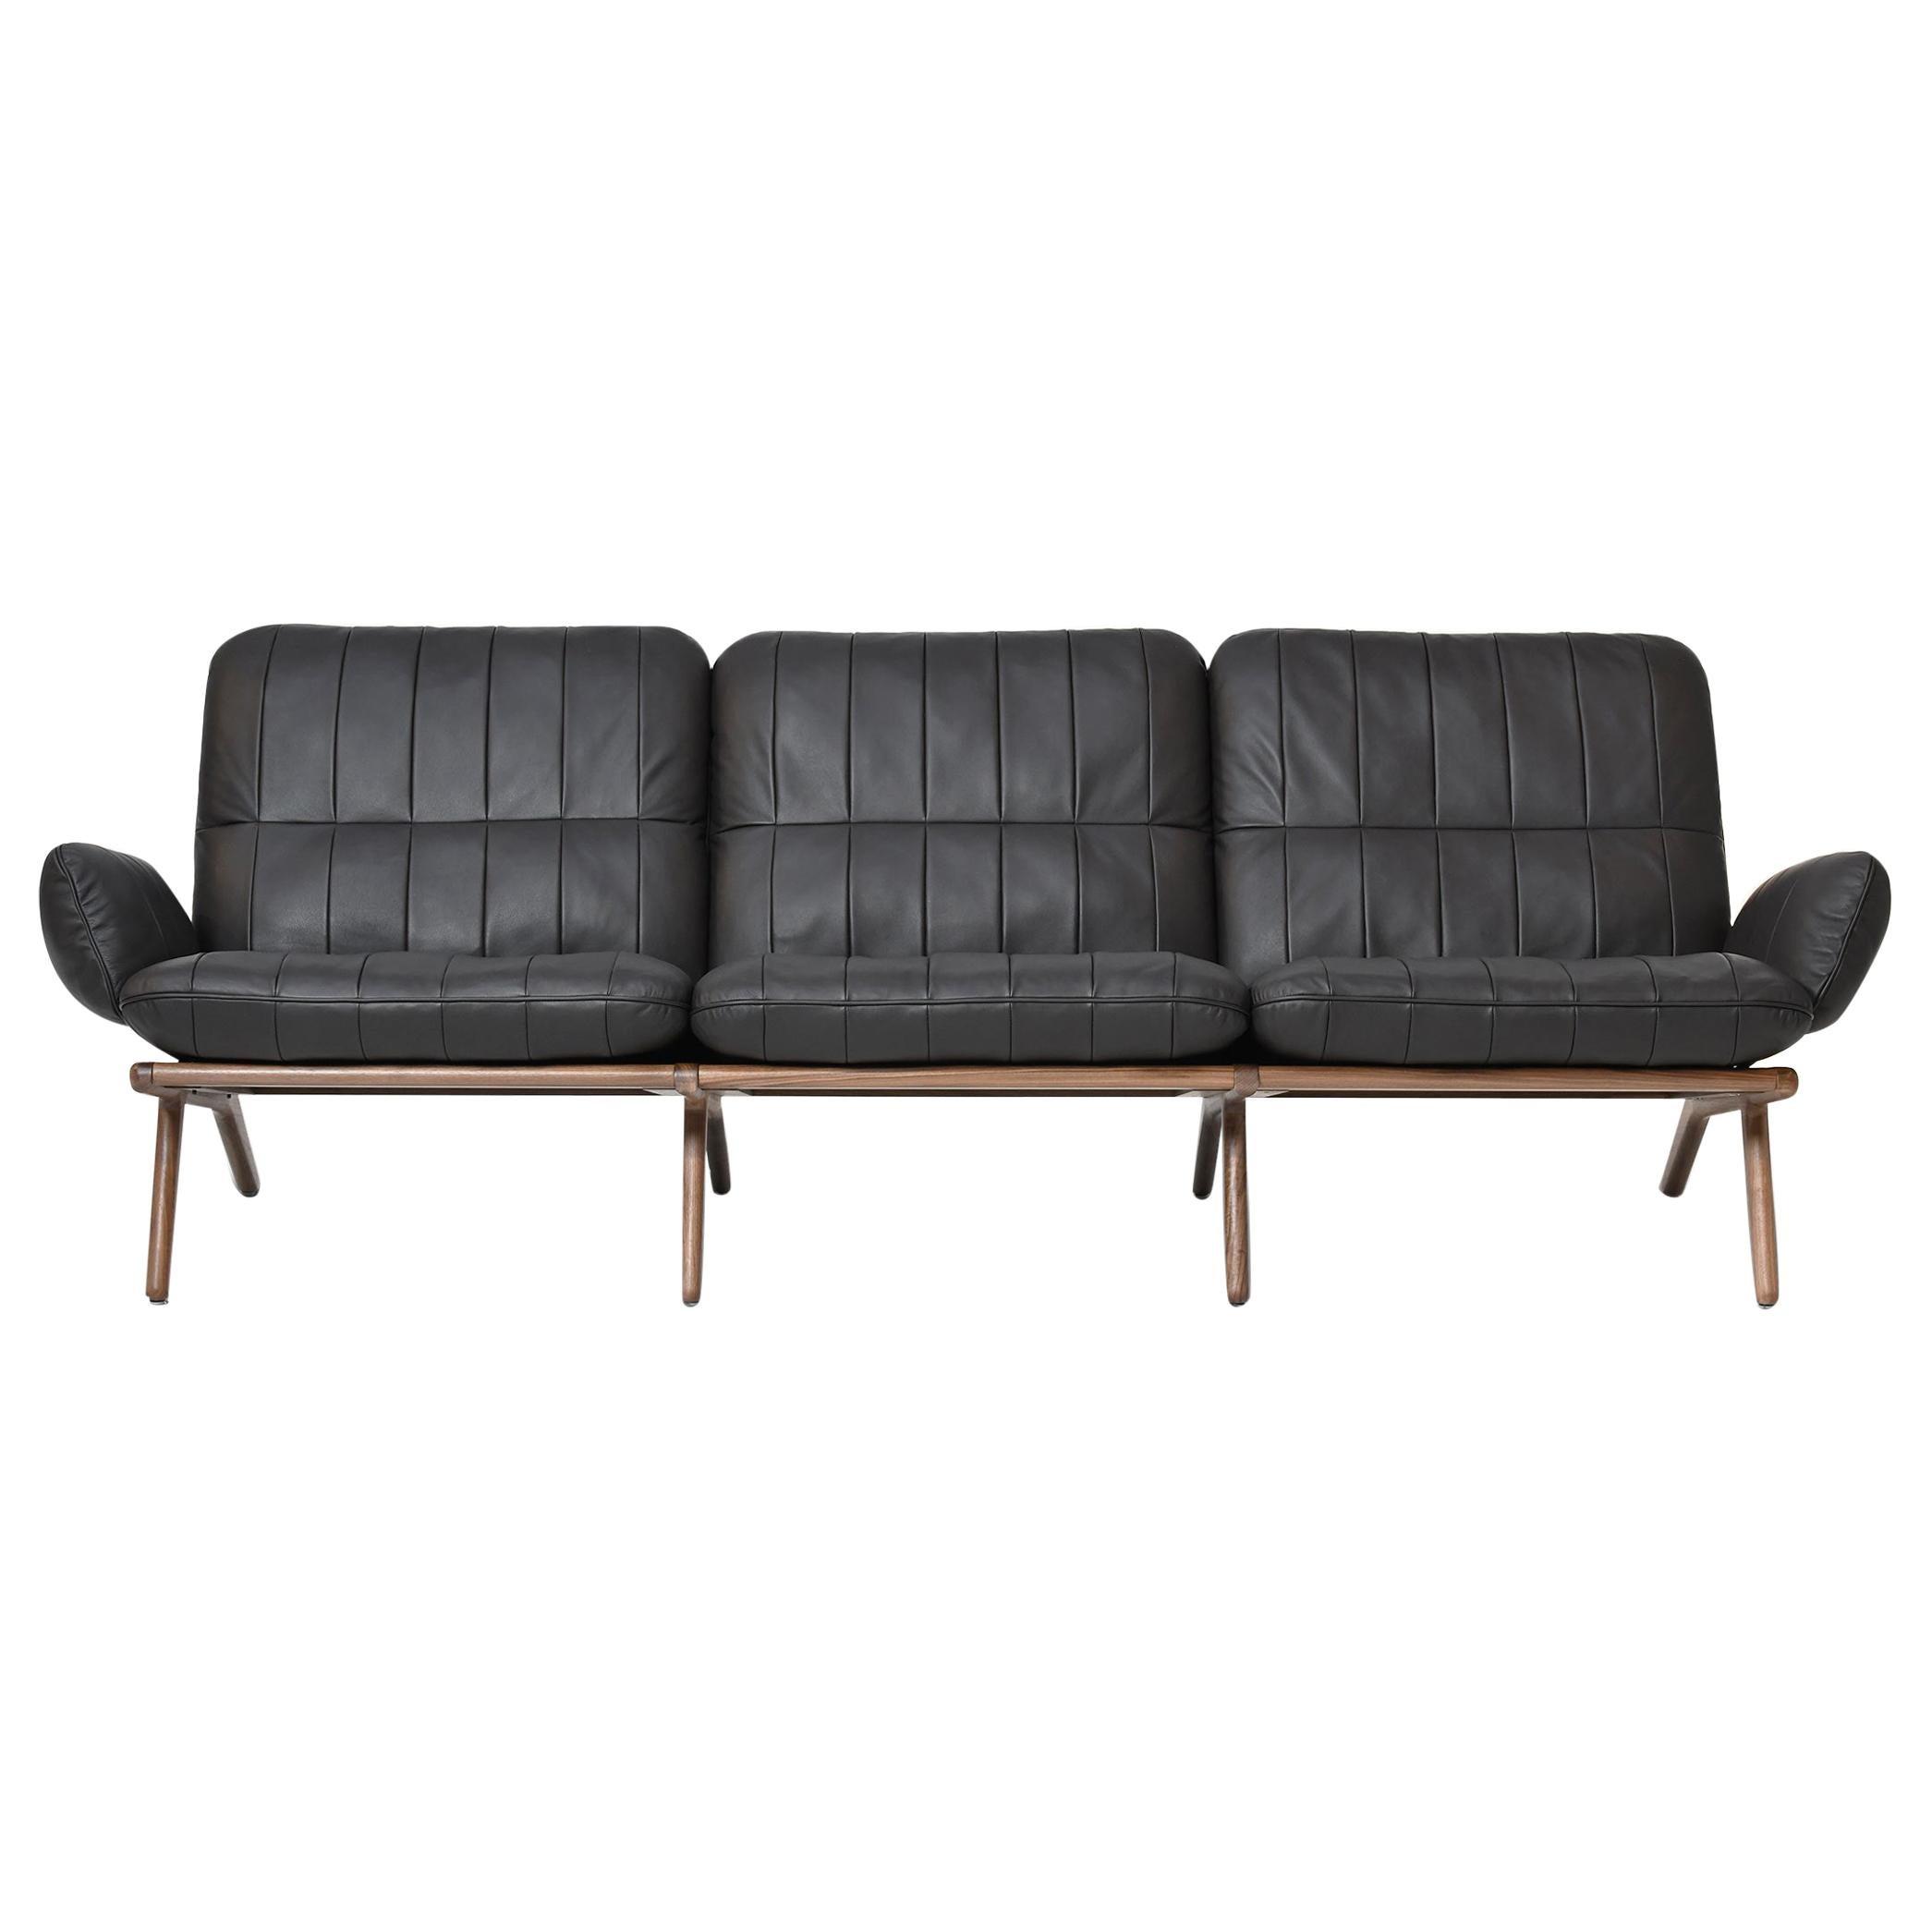 De Sede DS 531 Three-Seat Sofa in Black Upholstery by De Sede Design-Team